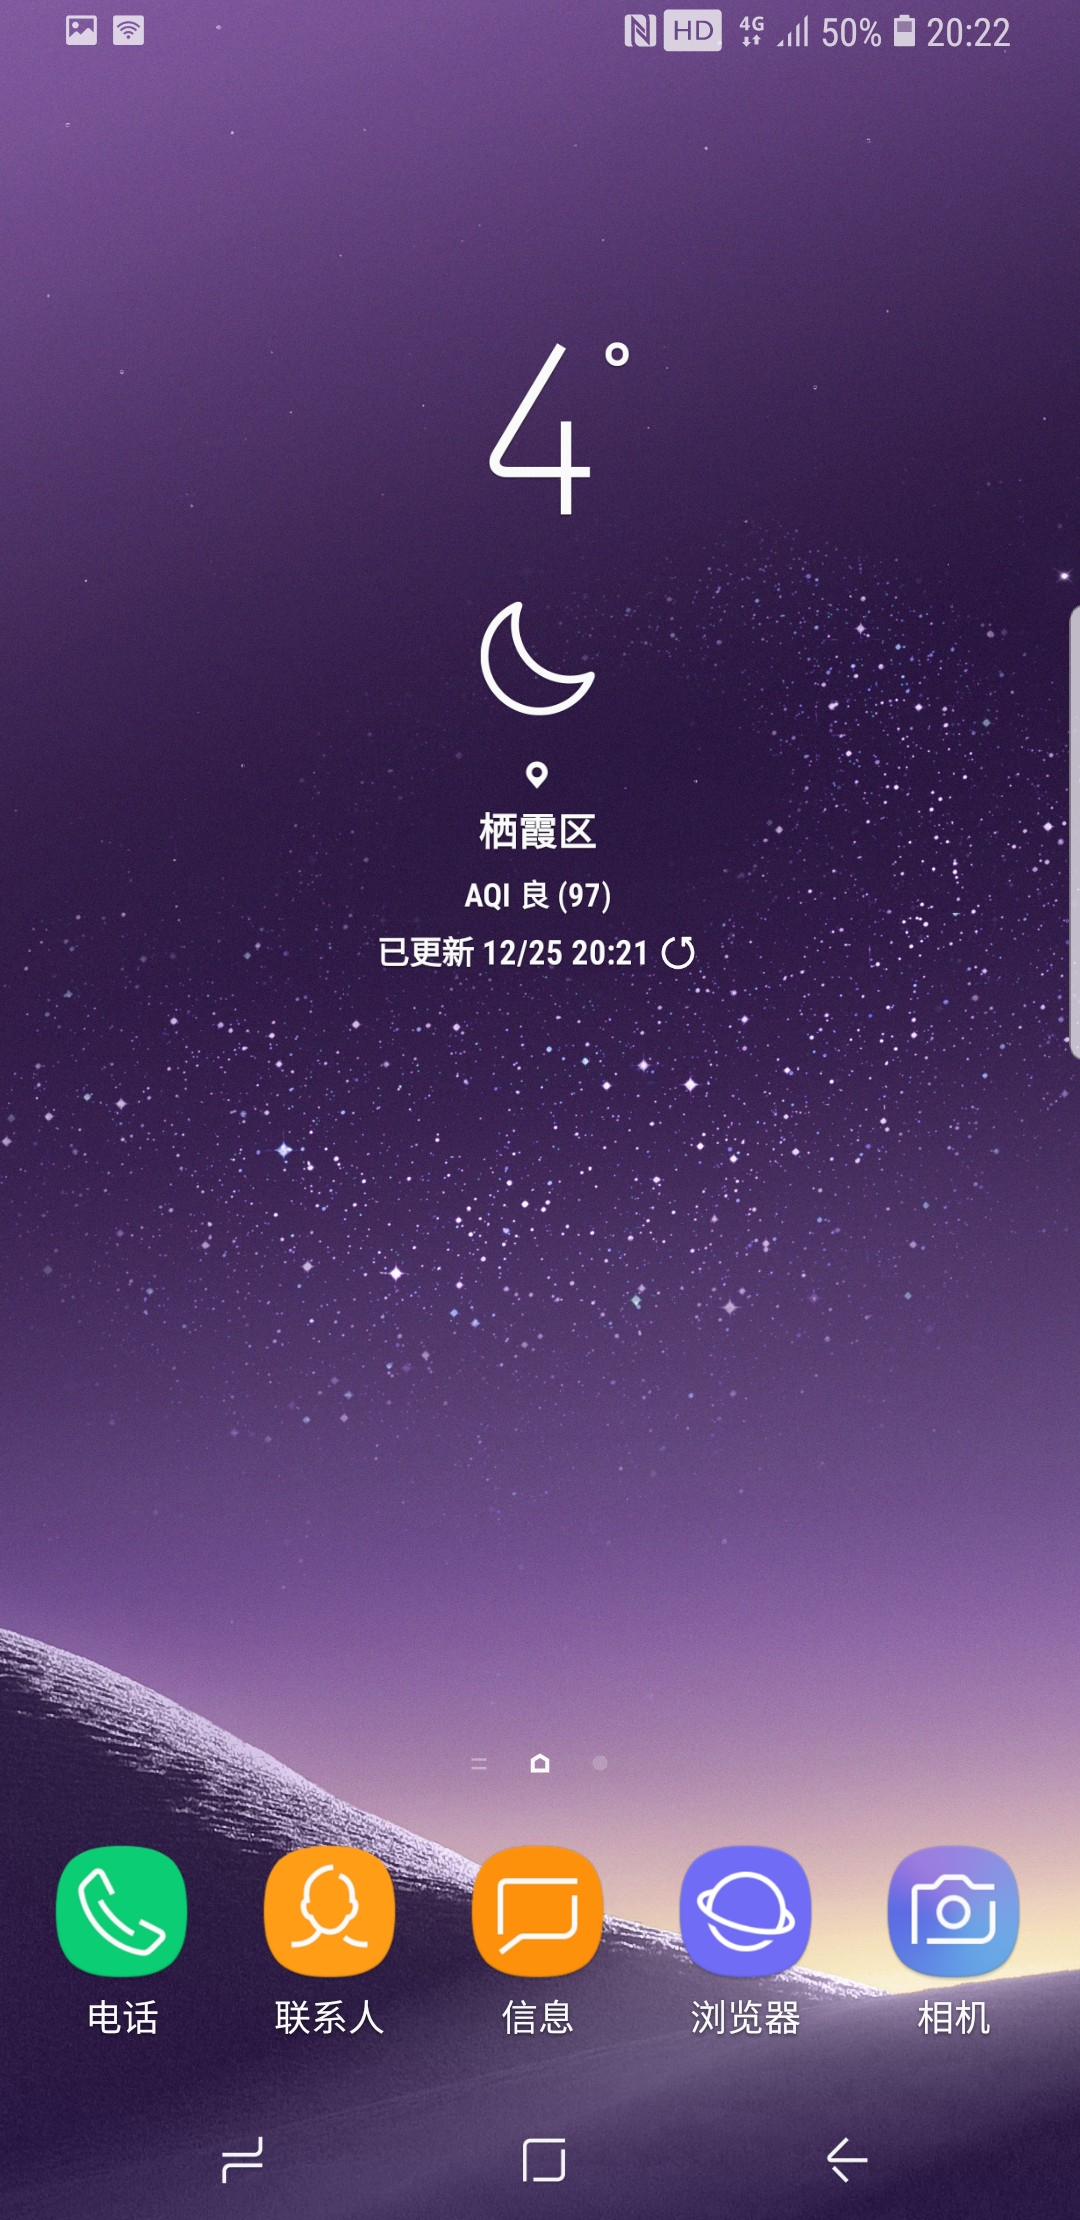 Screenshot_Samsung Experience Home_20171225-20221.jpg